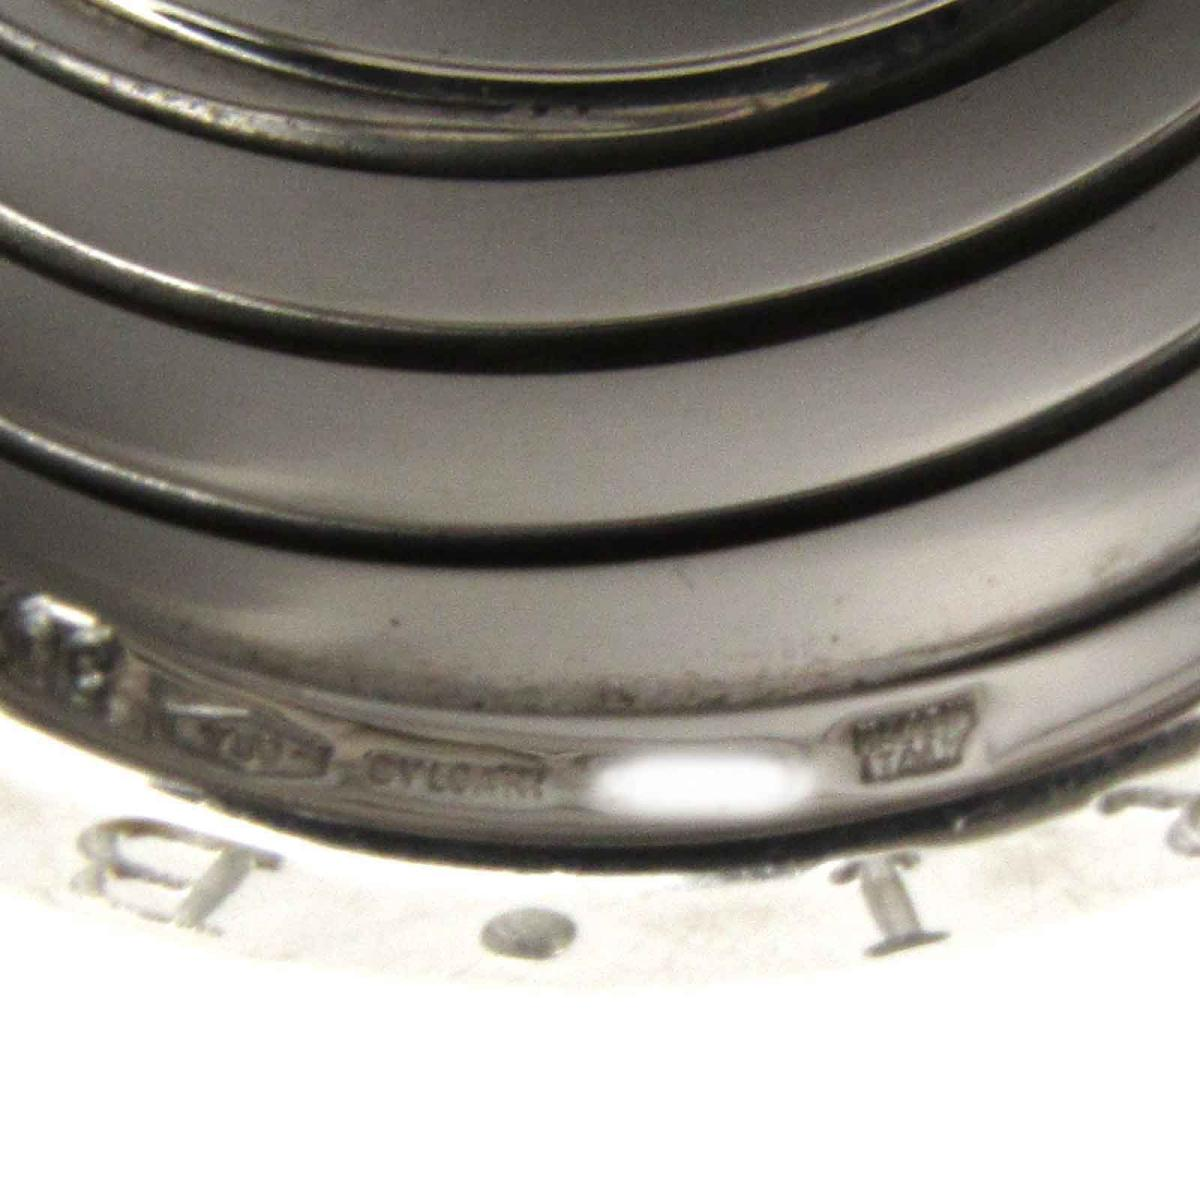 72cd4fec270f アクセサリー ブルガリ B-zero1 SALE ビーゼロワン リング 指輪 HERMES M ...